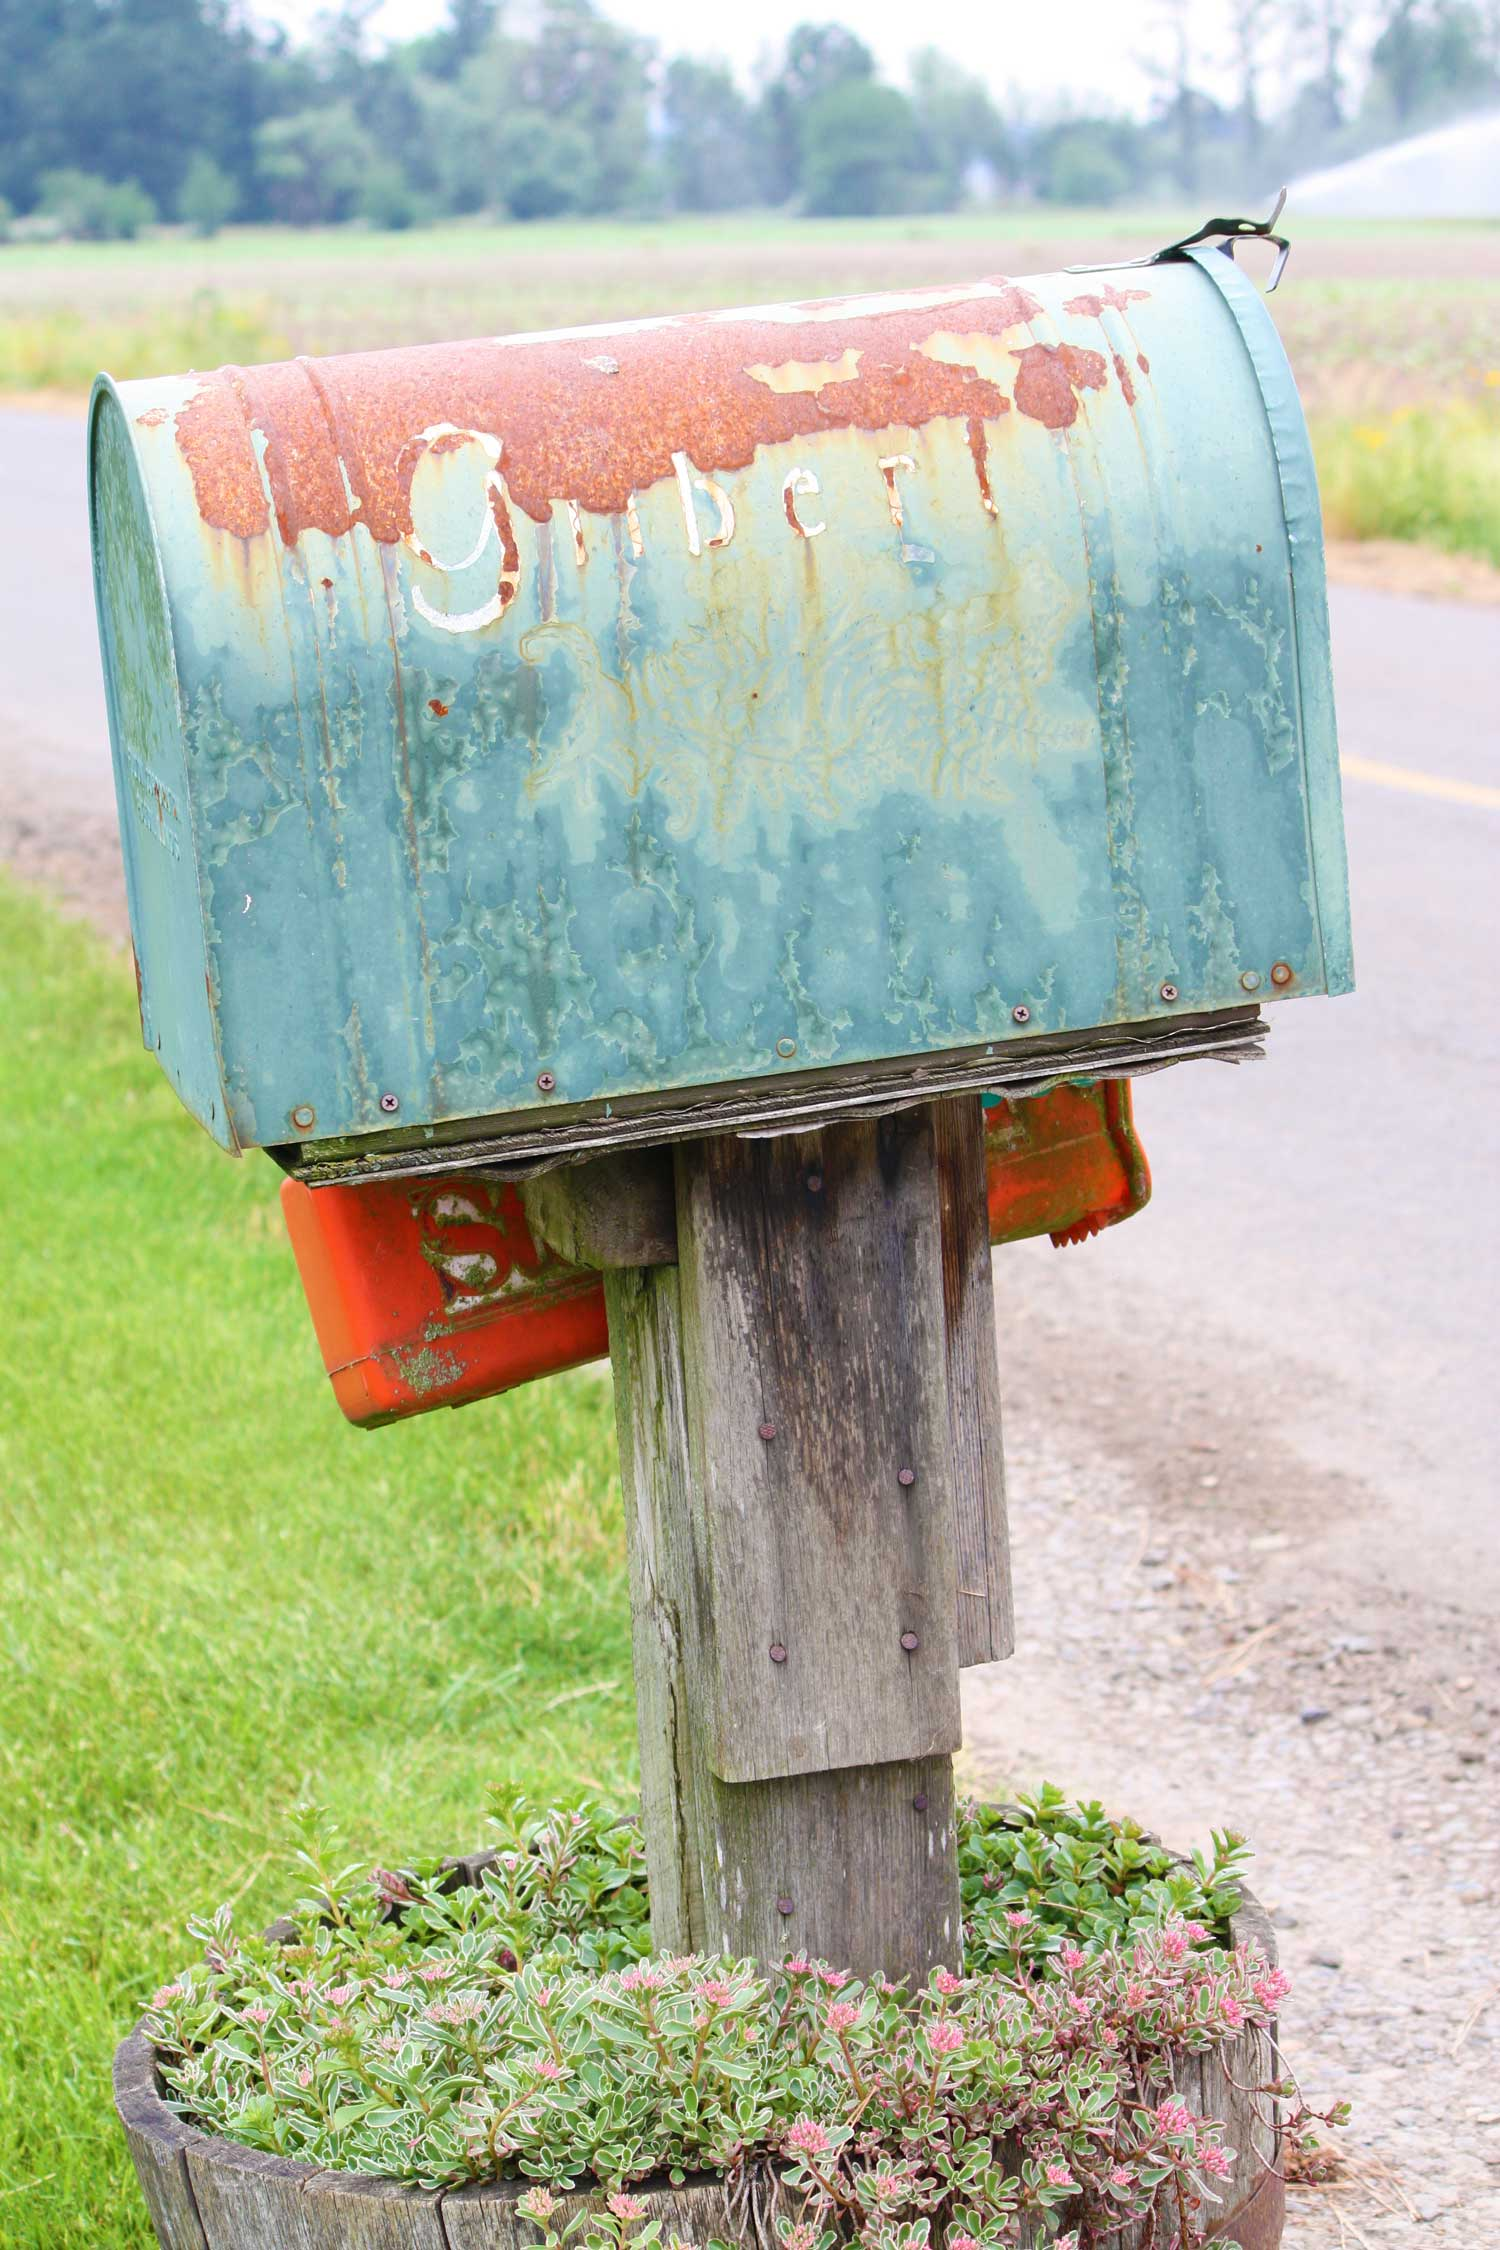 Uncle-Tim's-Mail-Box_adj_web.jpg